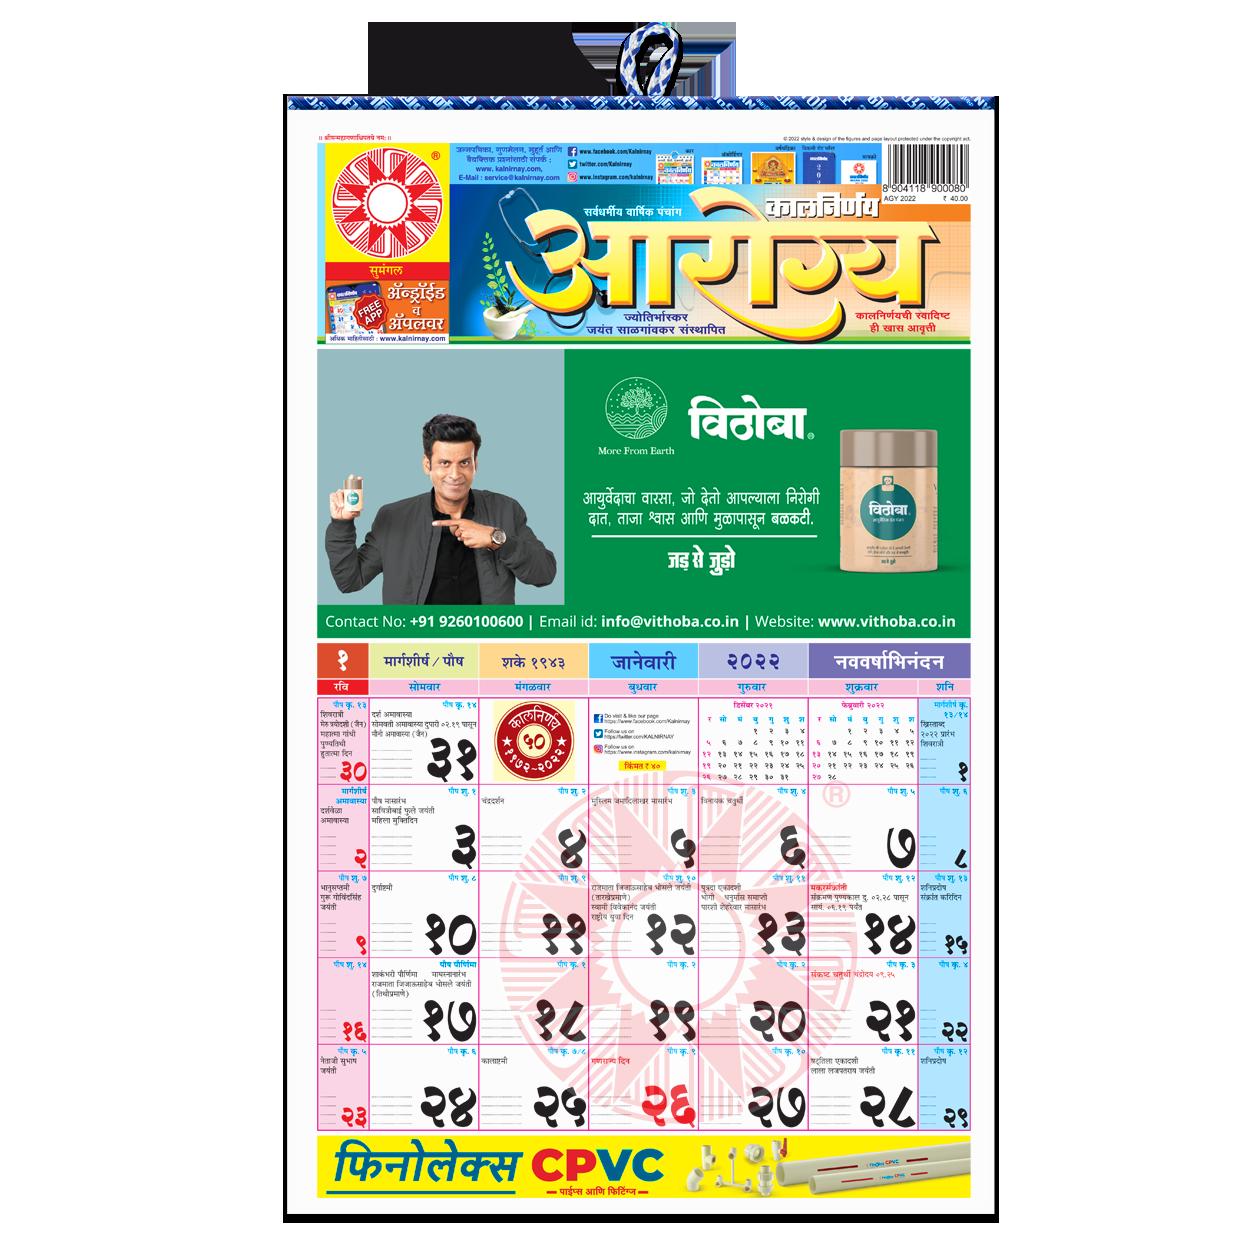 Arogya 2022 | Health Awareness | Health 2022 | Arogya Calmanac | Calendar 2022 | 2022 Calendar | Health Calendar | Kalnirnay Special Edition